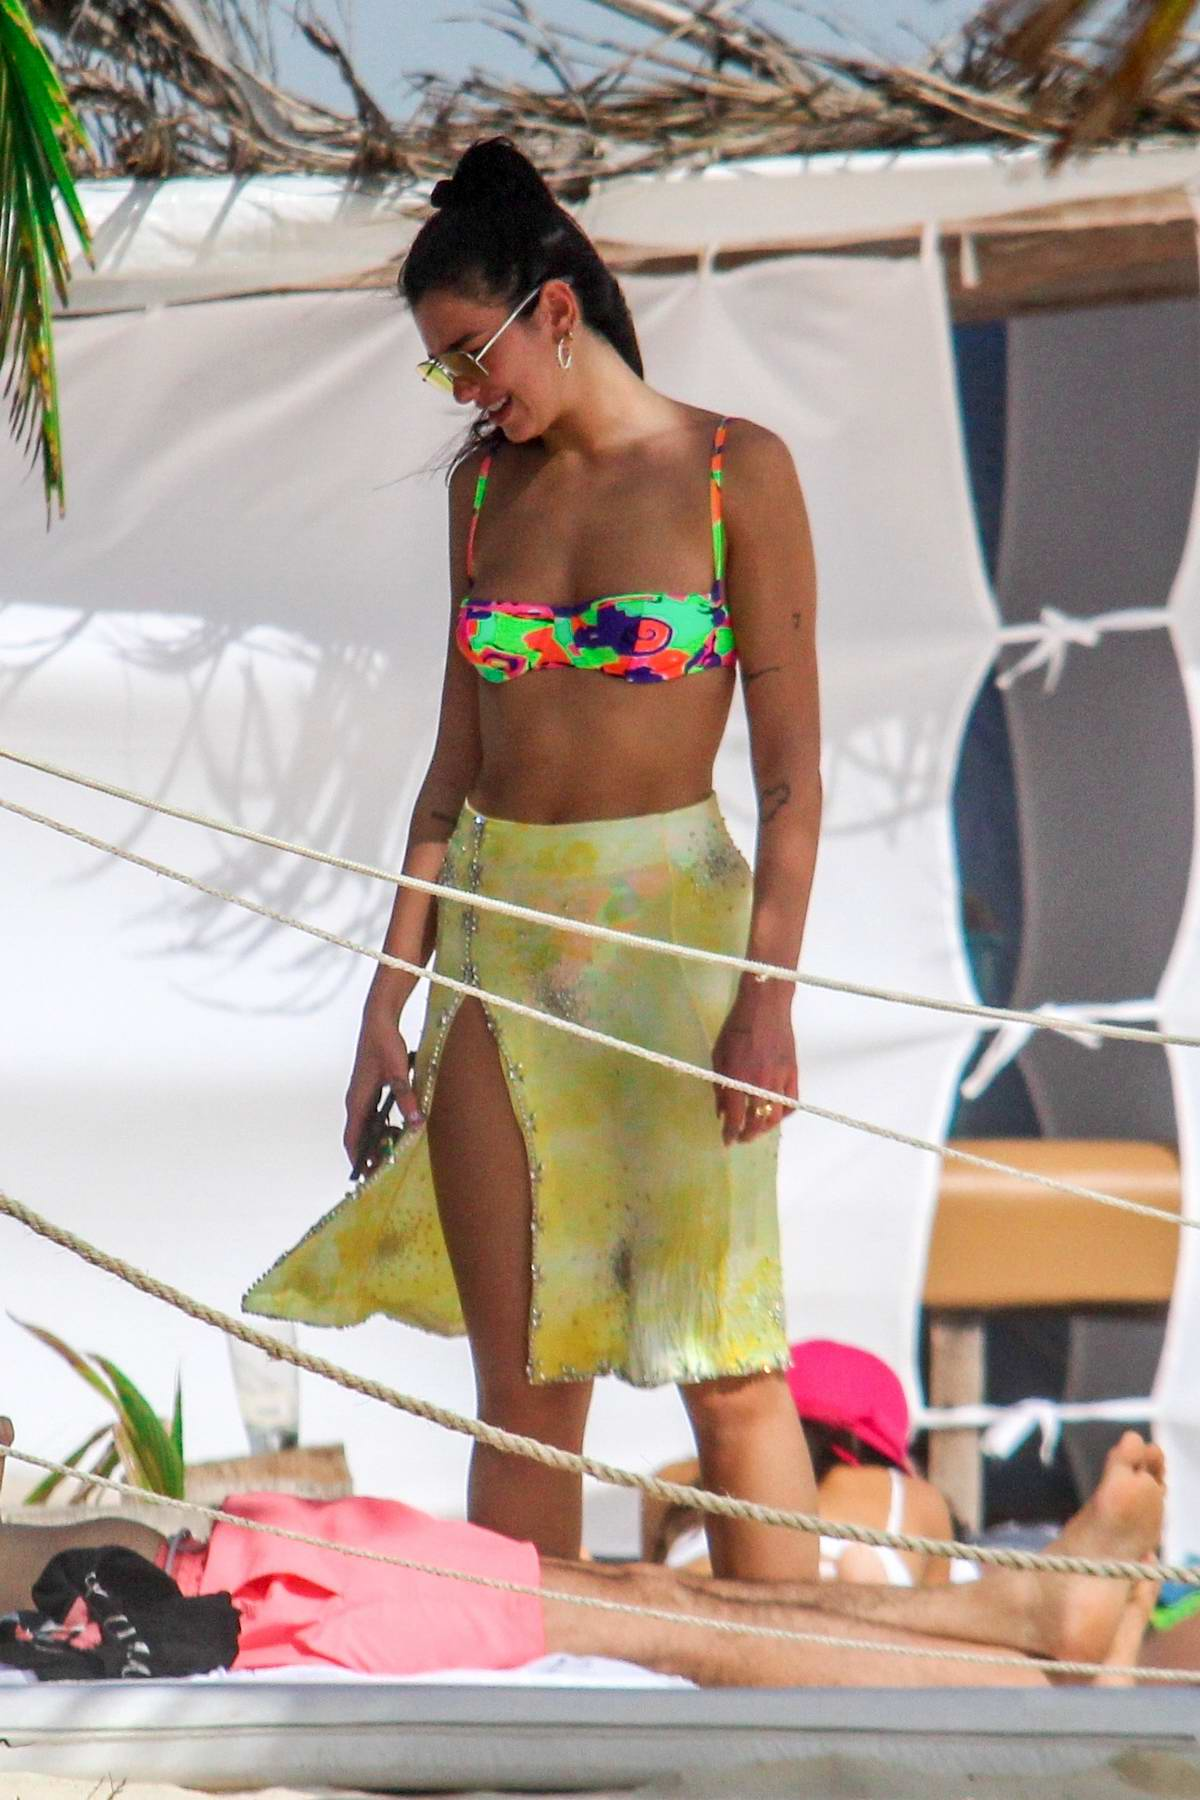 Dua Lipa looks great in a colorful bikini while vacationing in Tulum, Mexico